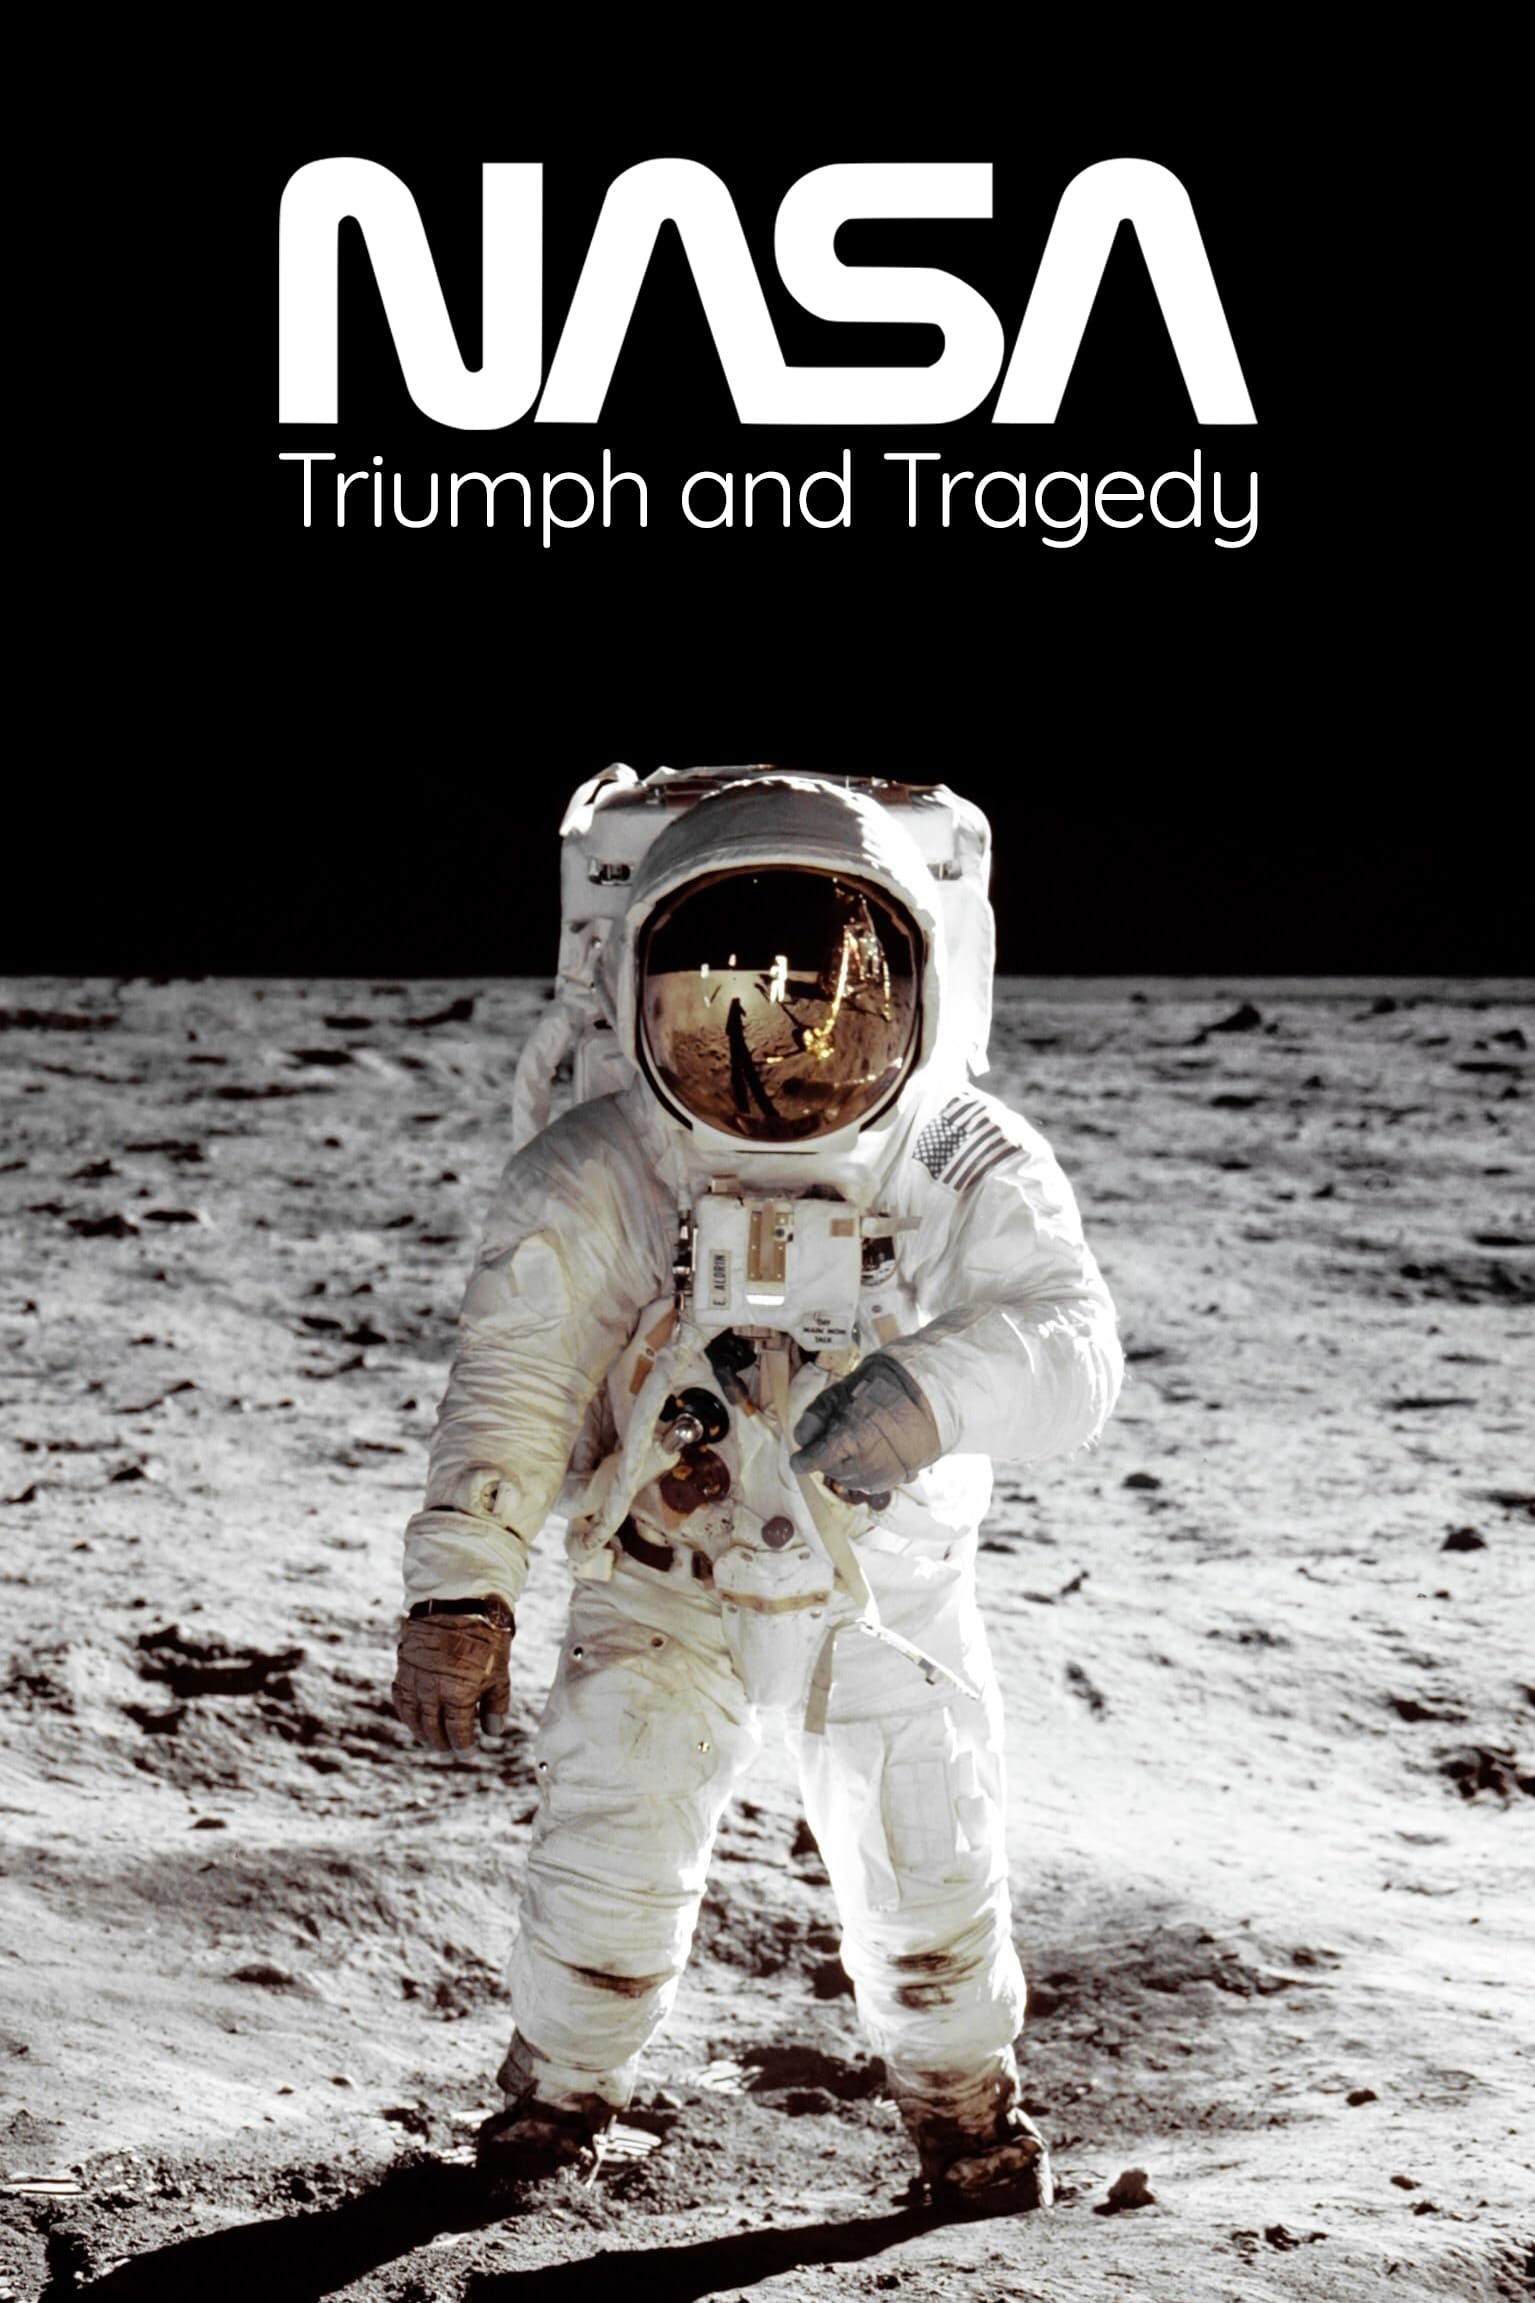 nasa shuttle development triumph and tragedy - HD1535×2303